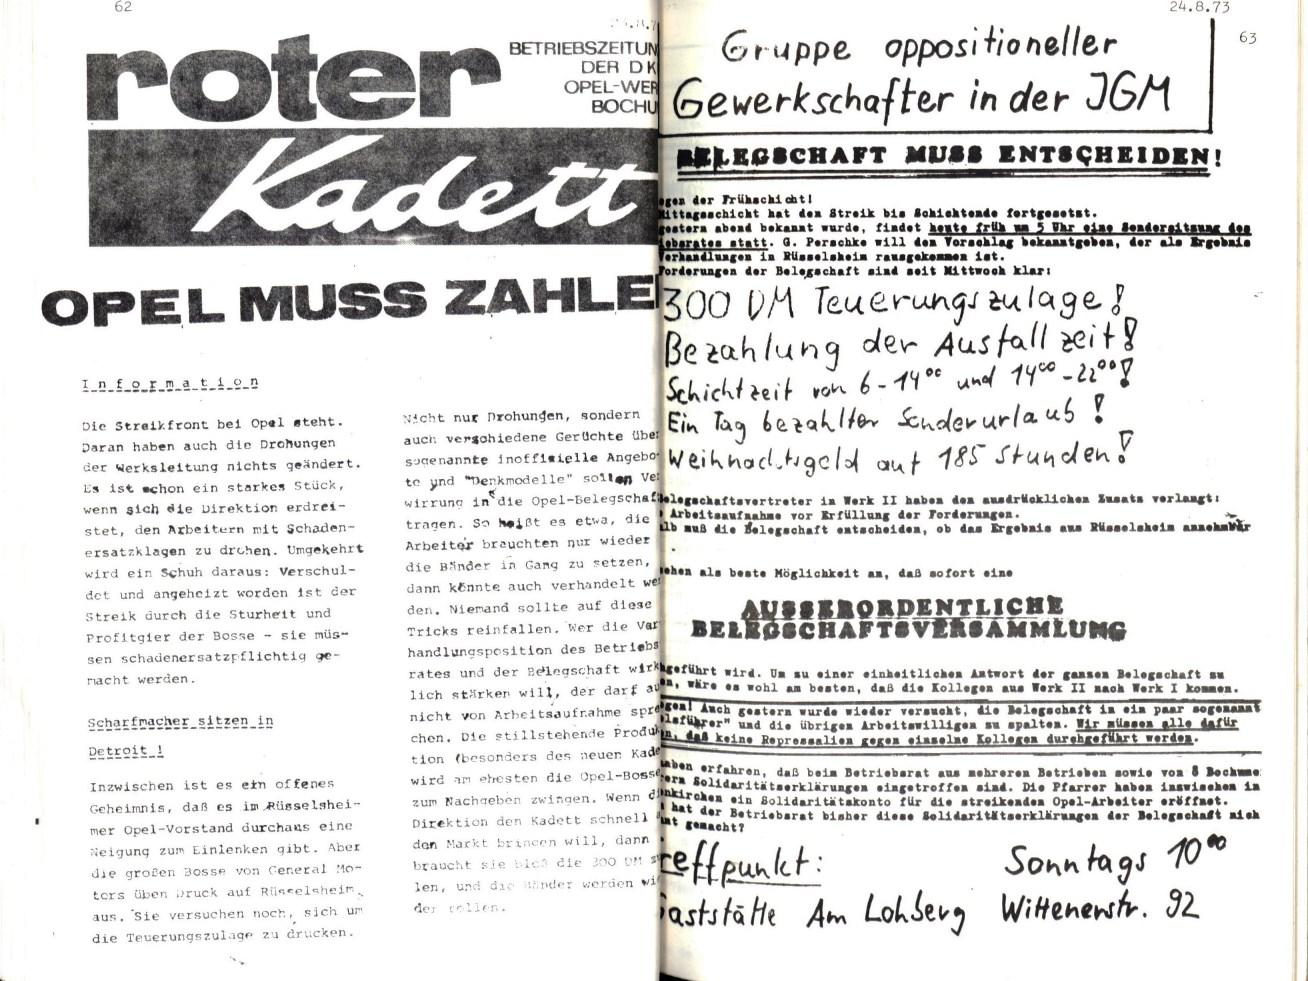 Bochum_IGM_Opel_PG_Opel_streikt_1973_033